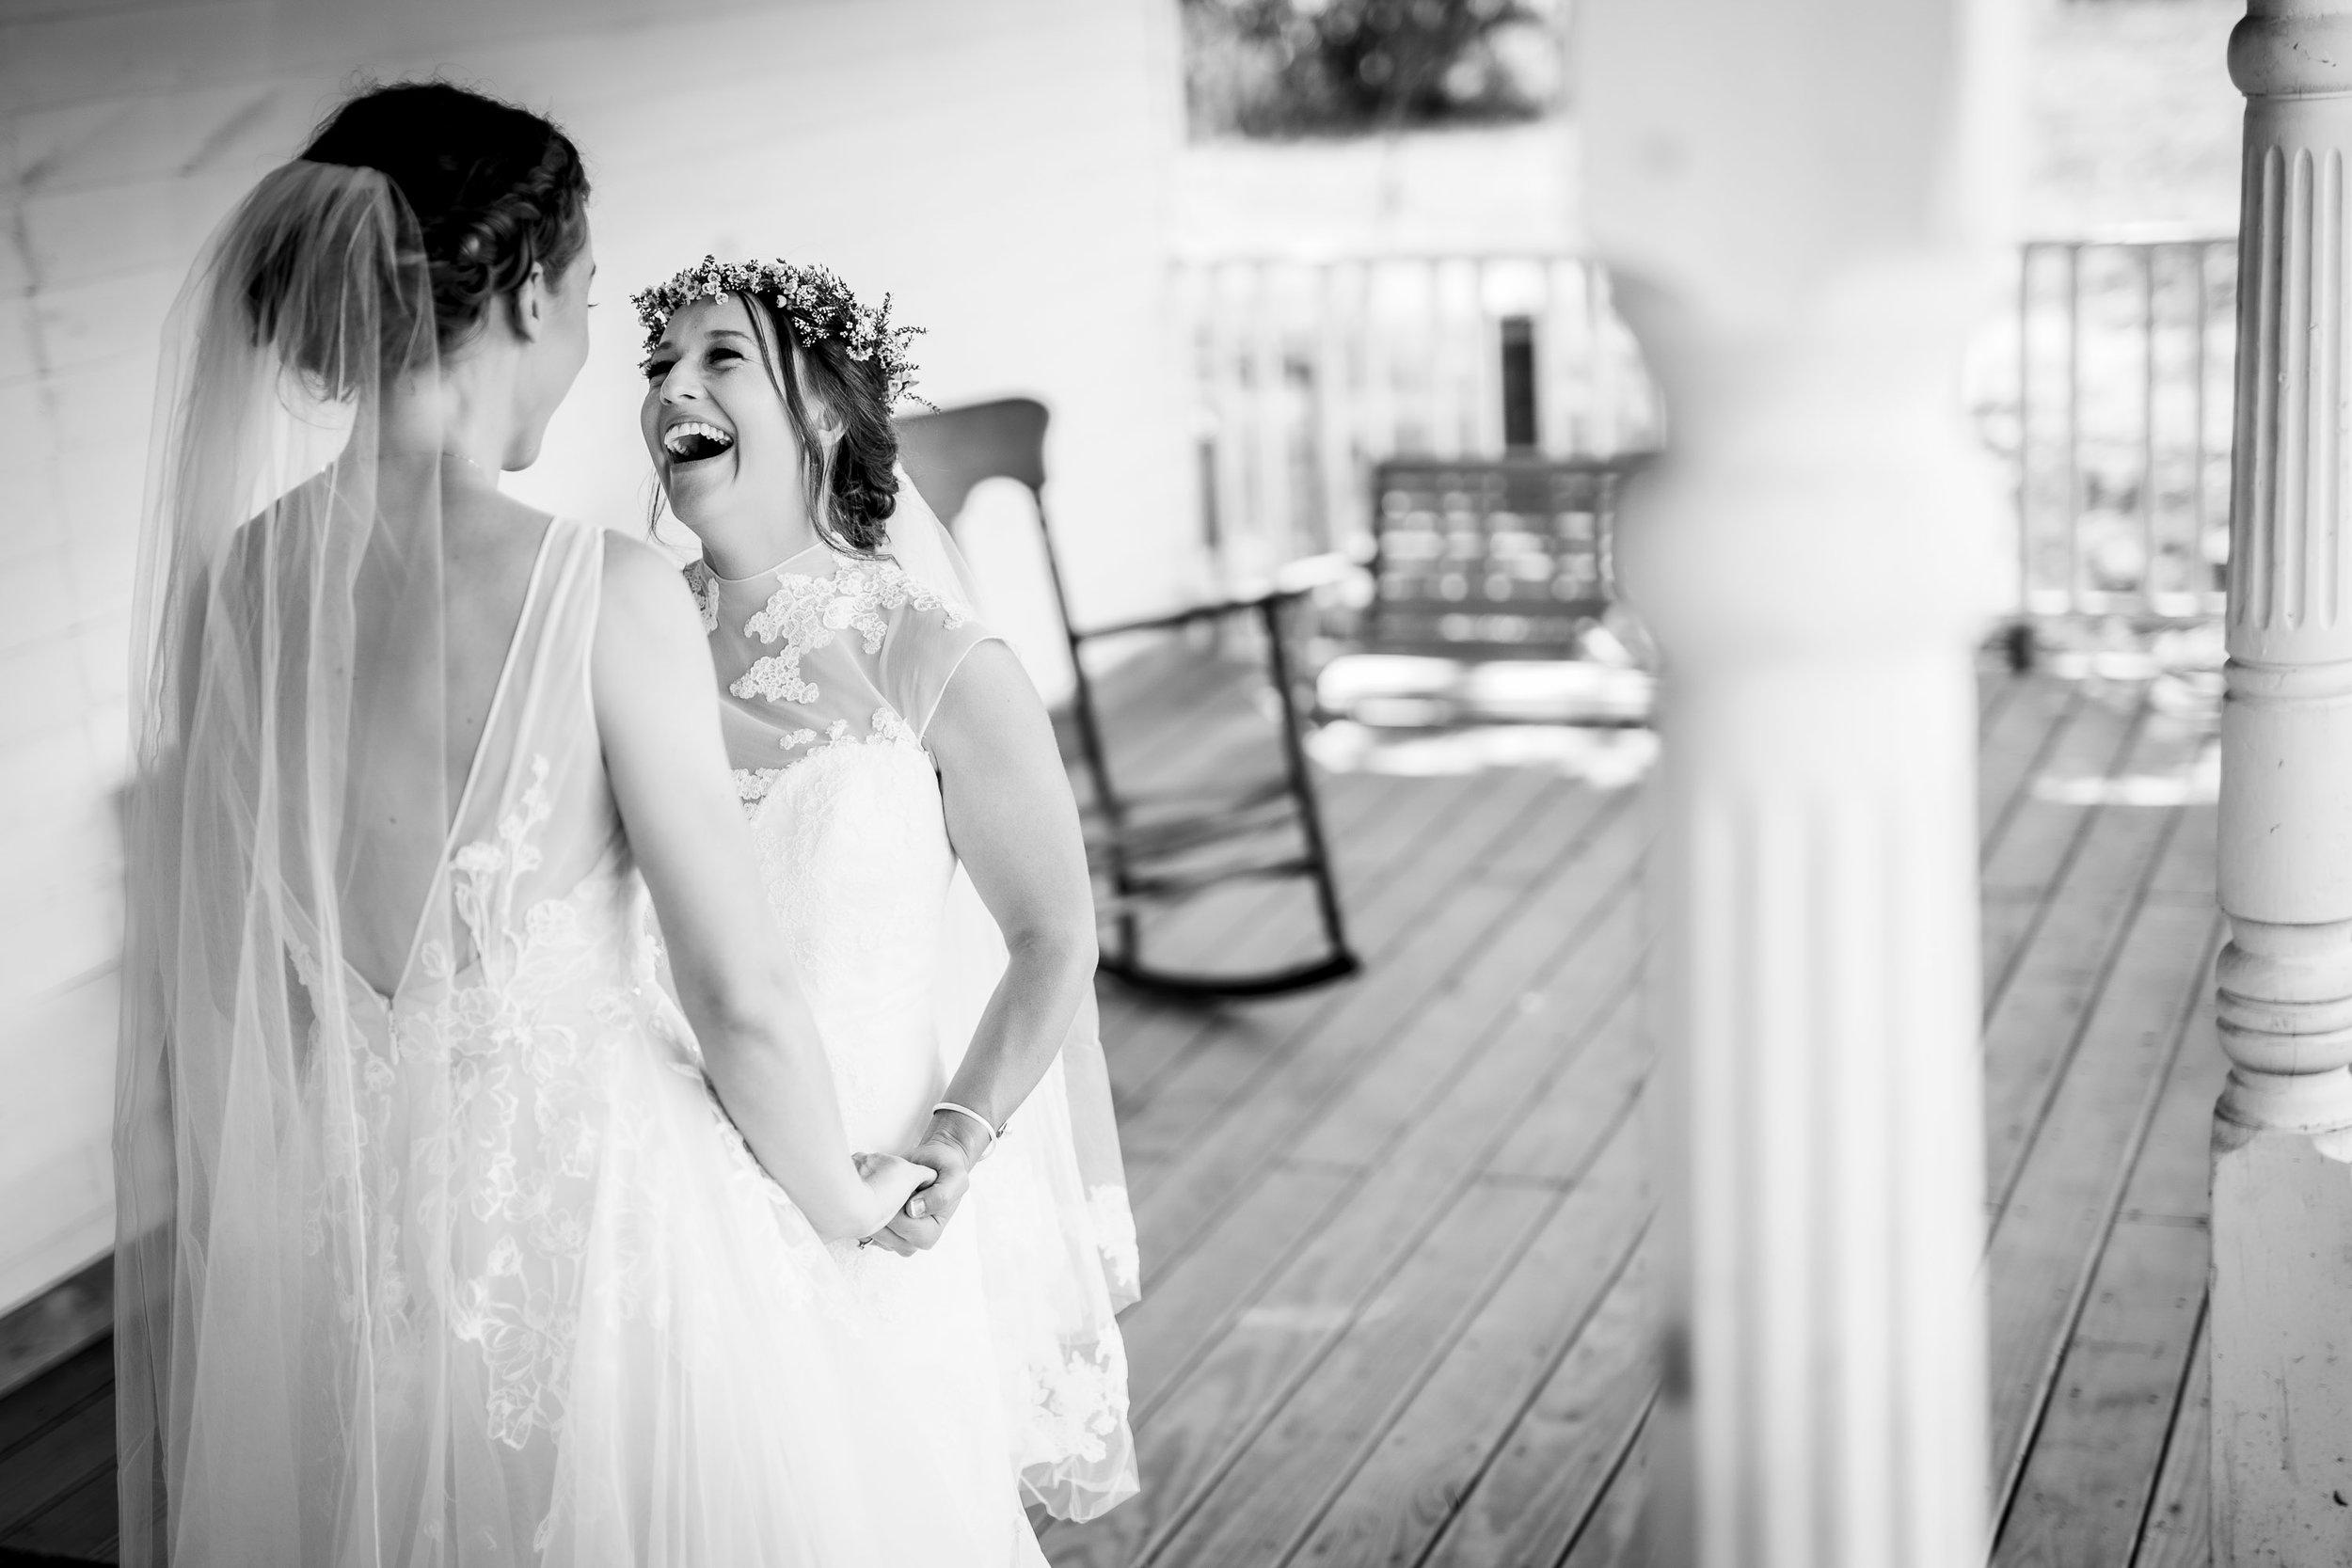 Rist_Canyon_Inn_Laporte_Wedding-73.jpg